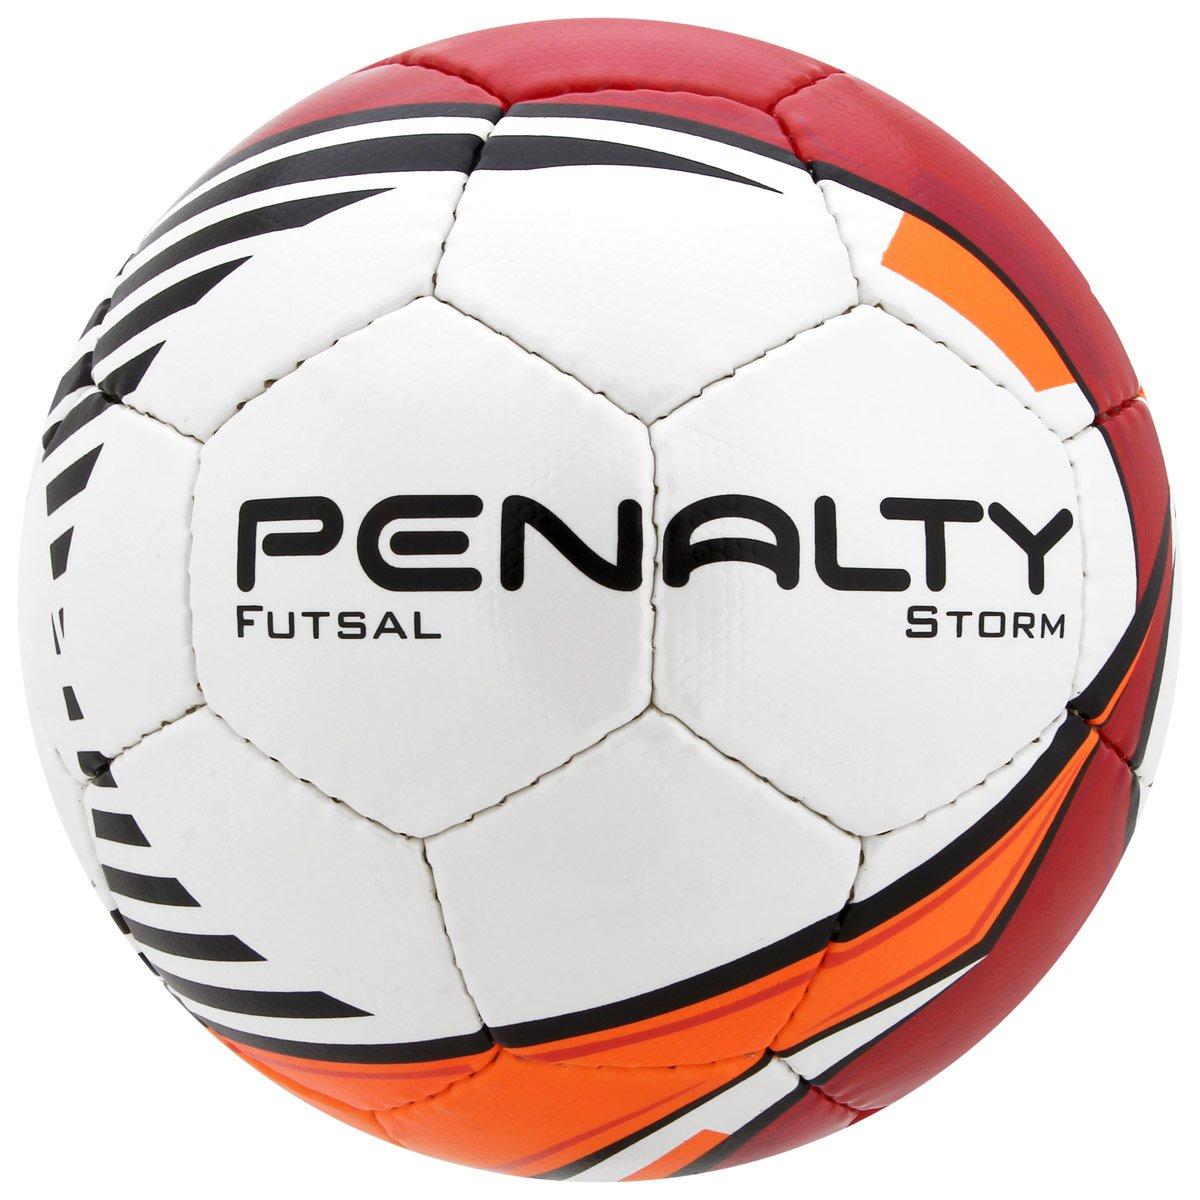 Bola Futebol Penalty Storm C C Futsal - Compre Agora  f5d222e7ae4d8